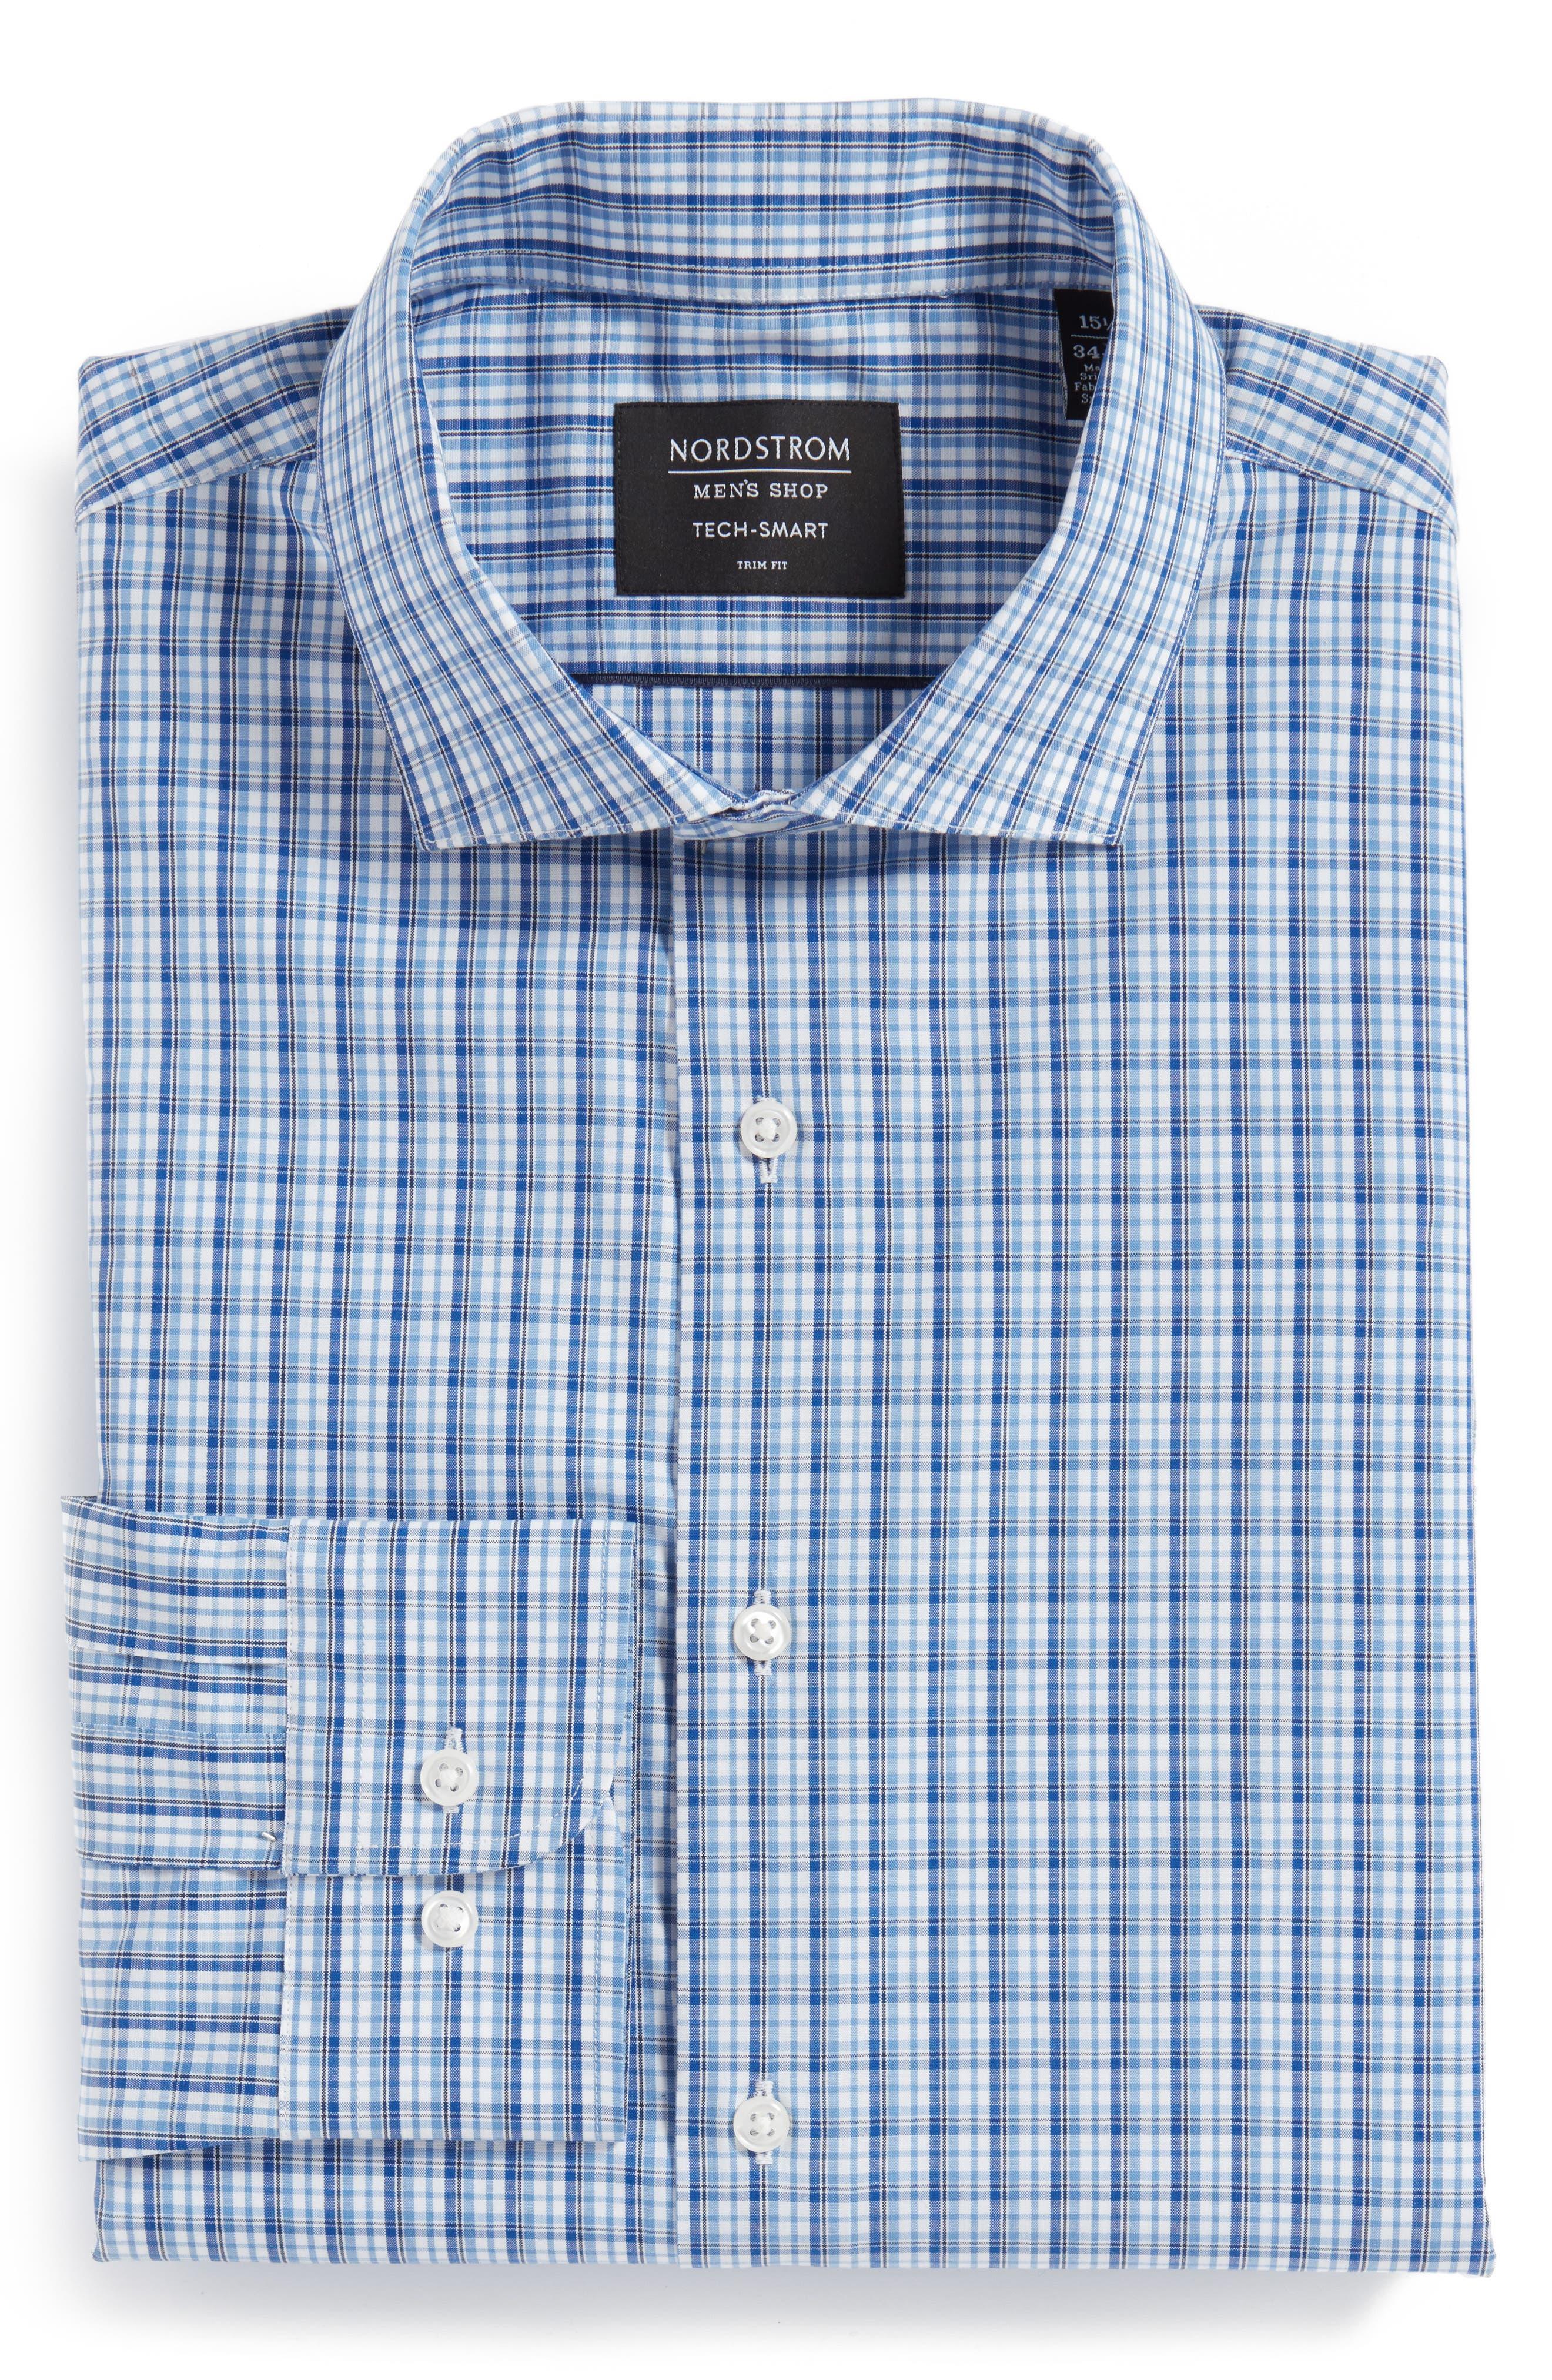 Main Image - Nordstrom Men's Shop Tech-Smart Trim Fit Stretch Check Dress Shirt